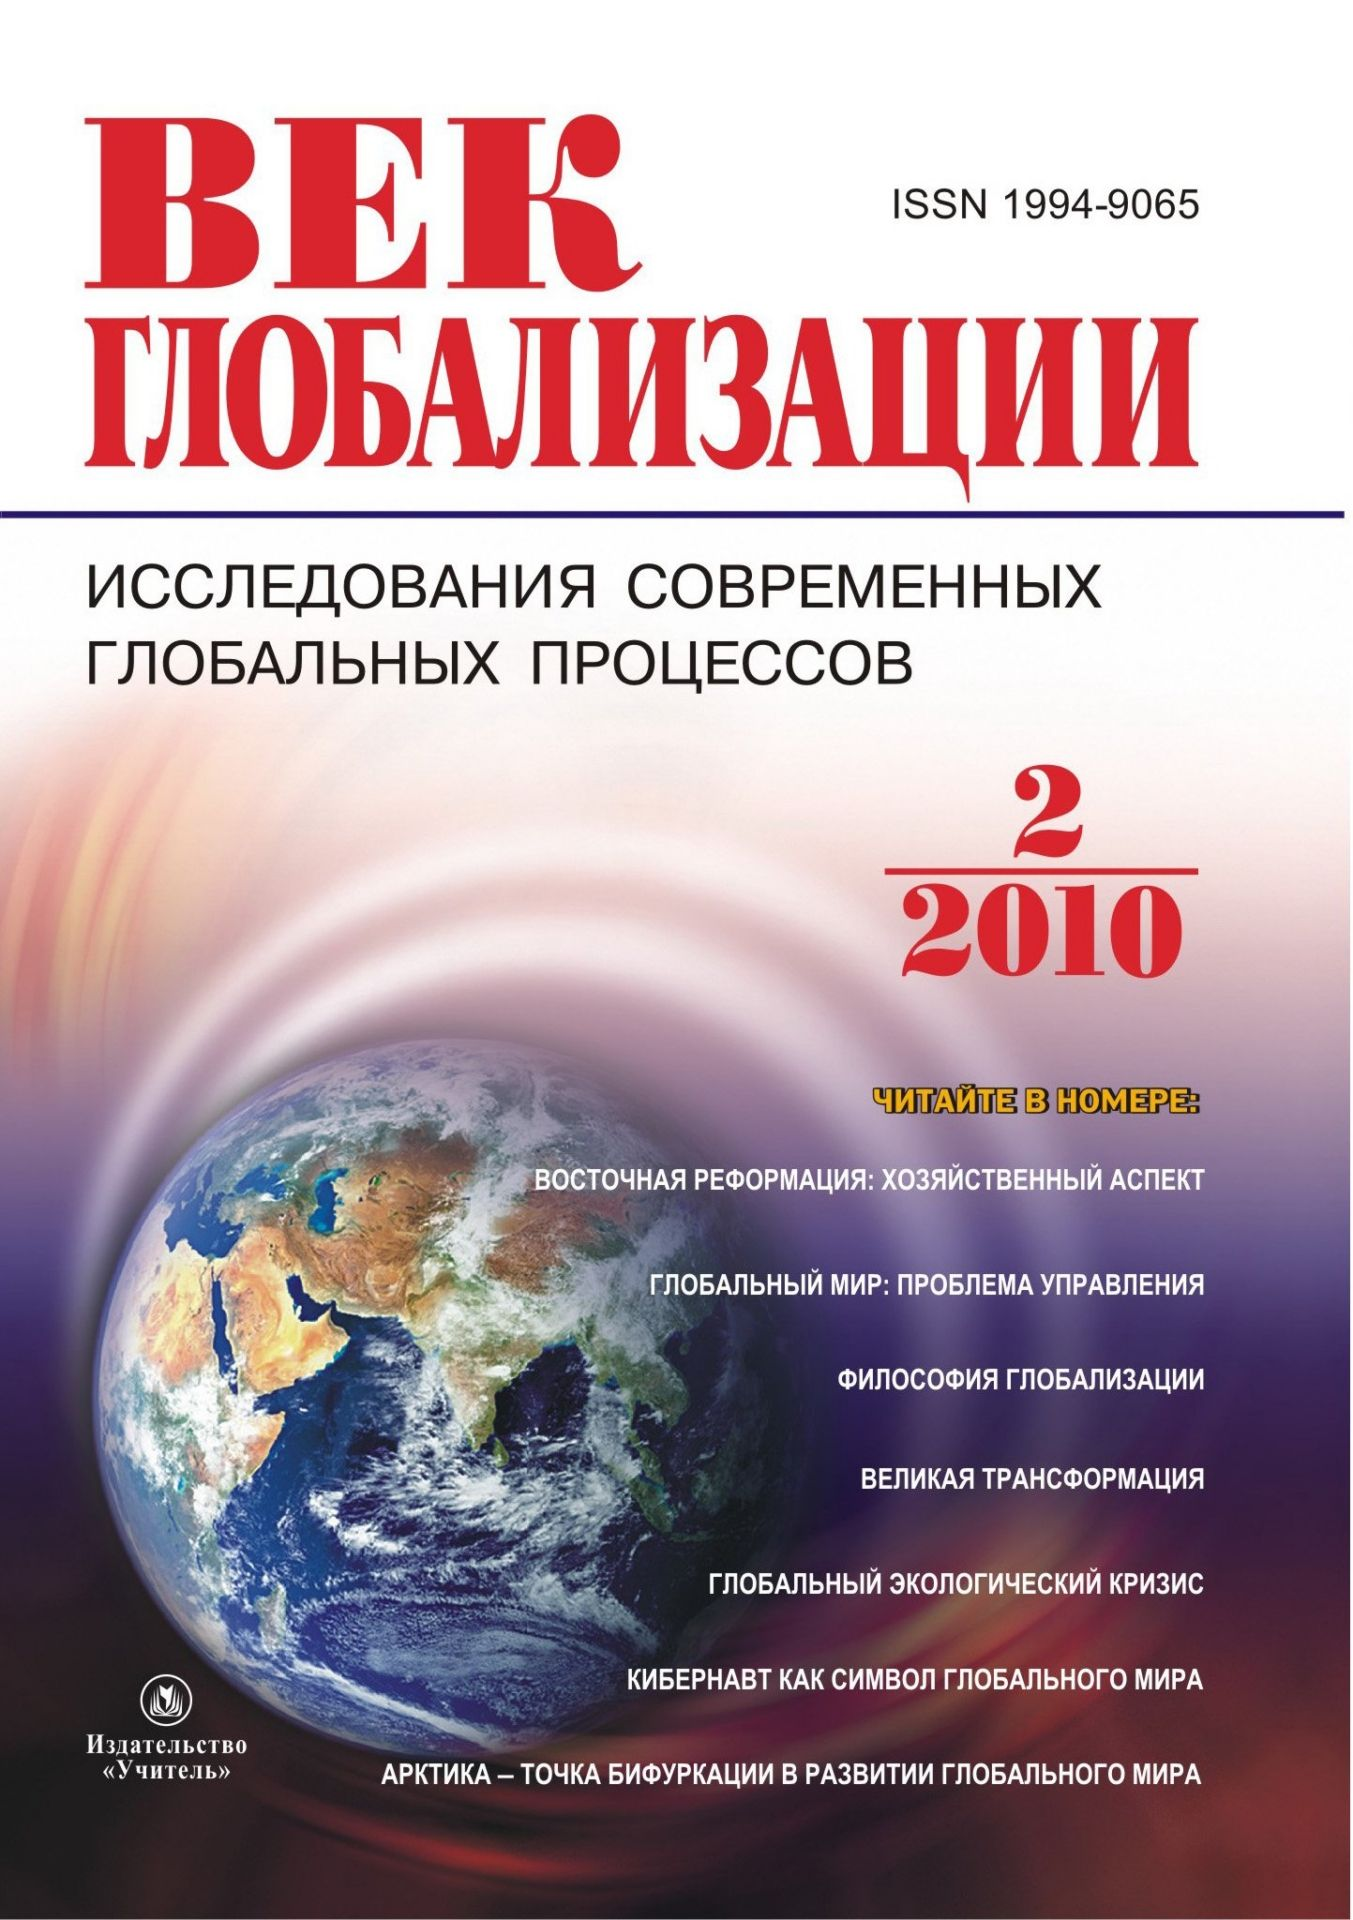 Журнал Век глобализации № 2 2010